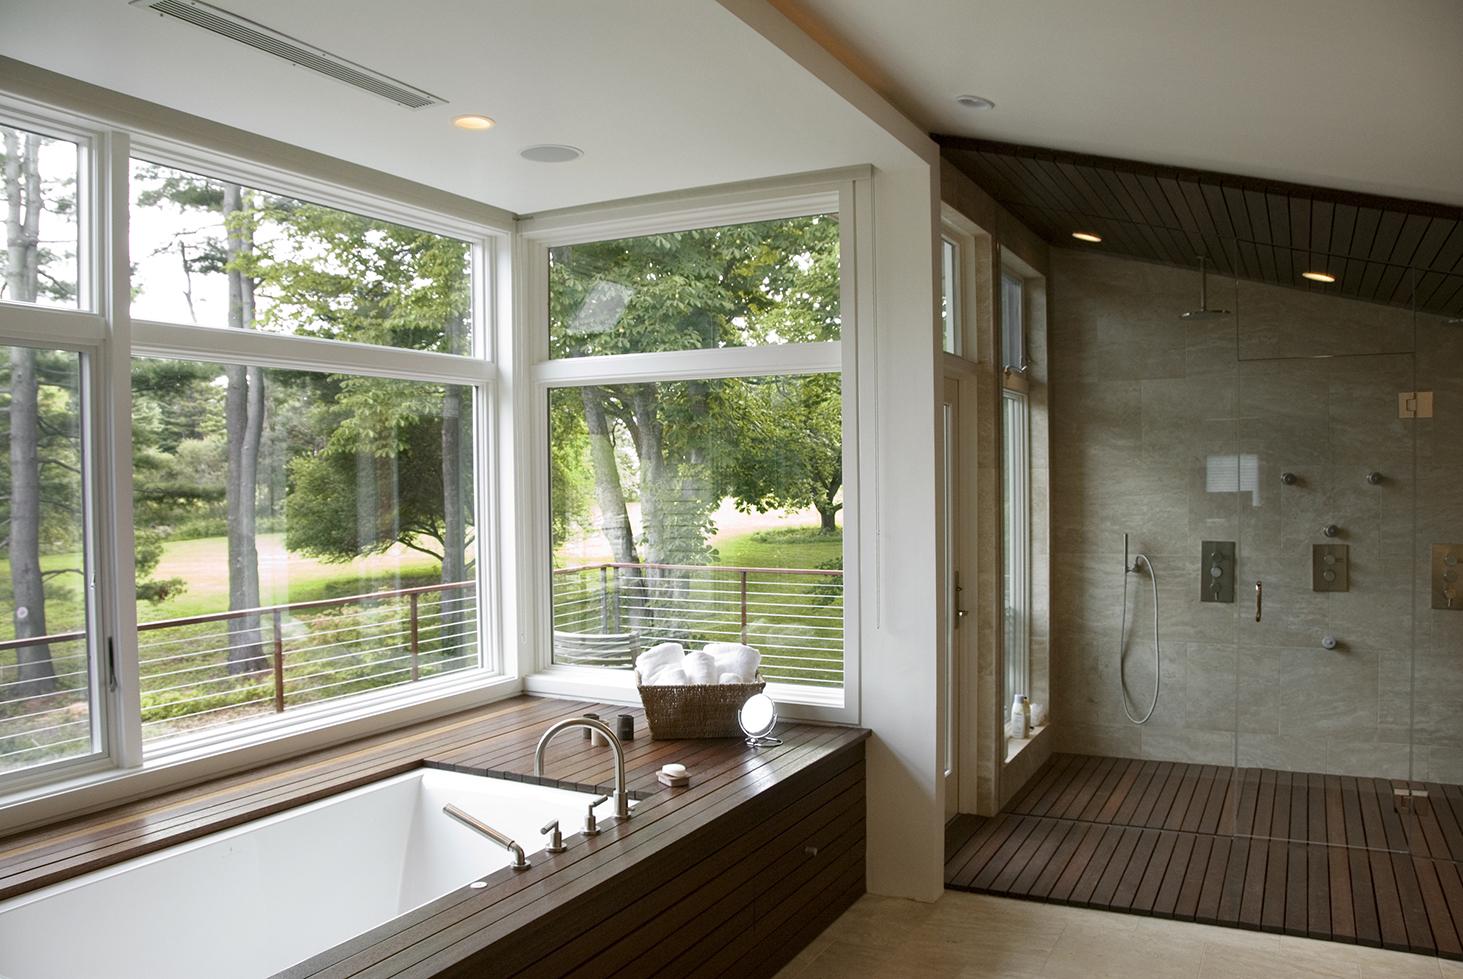 03_McGhee Hill Residence_Guest Bathtub and shower.jpg